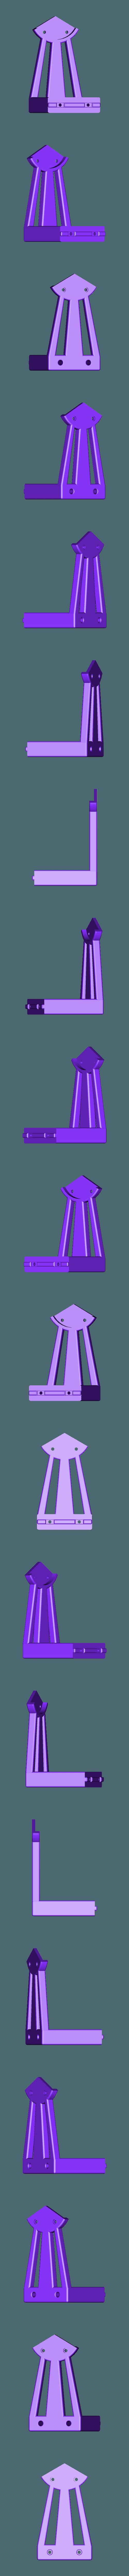 Brazo.stl Download free STL file Anycubic Kossel Plus Top Internal Spool holder - Fixed • 3D print object, TsunamiSoul